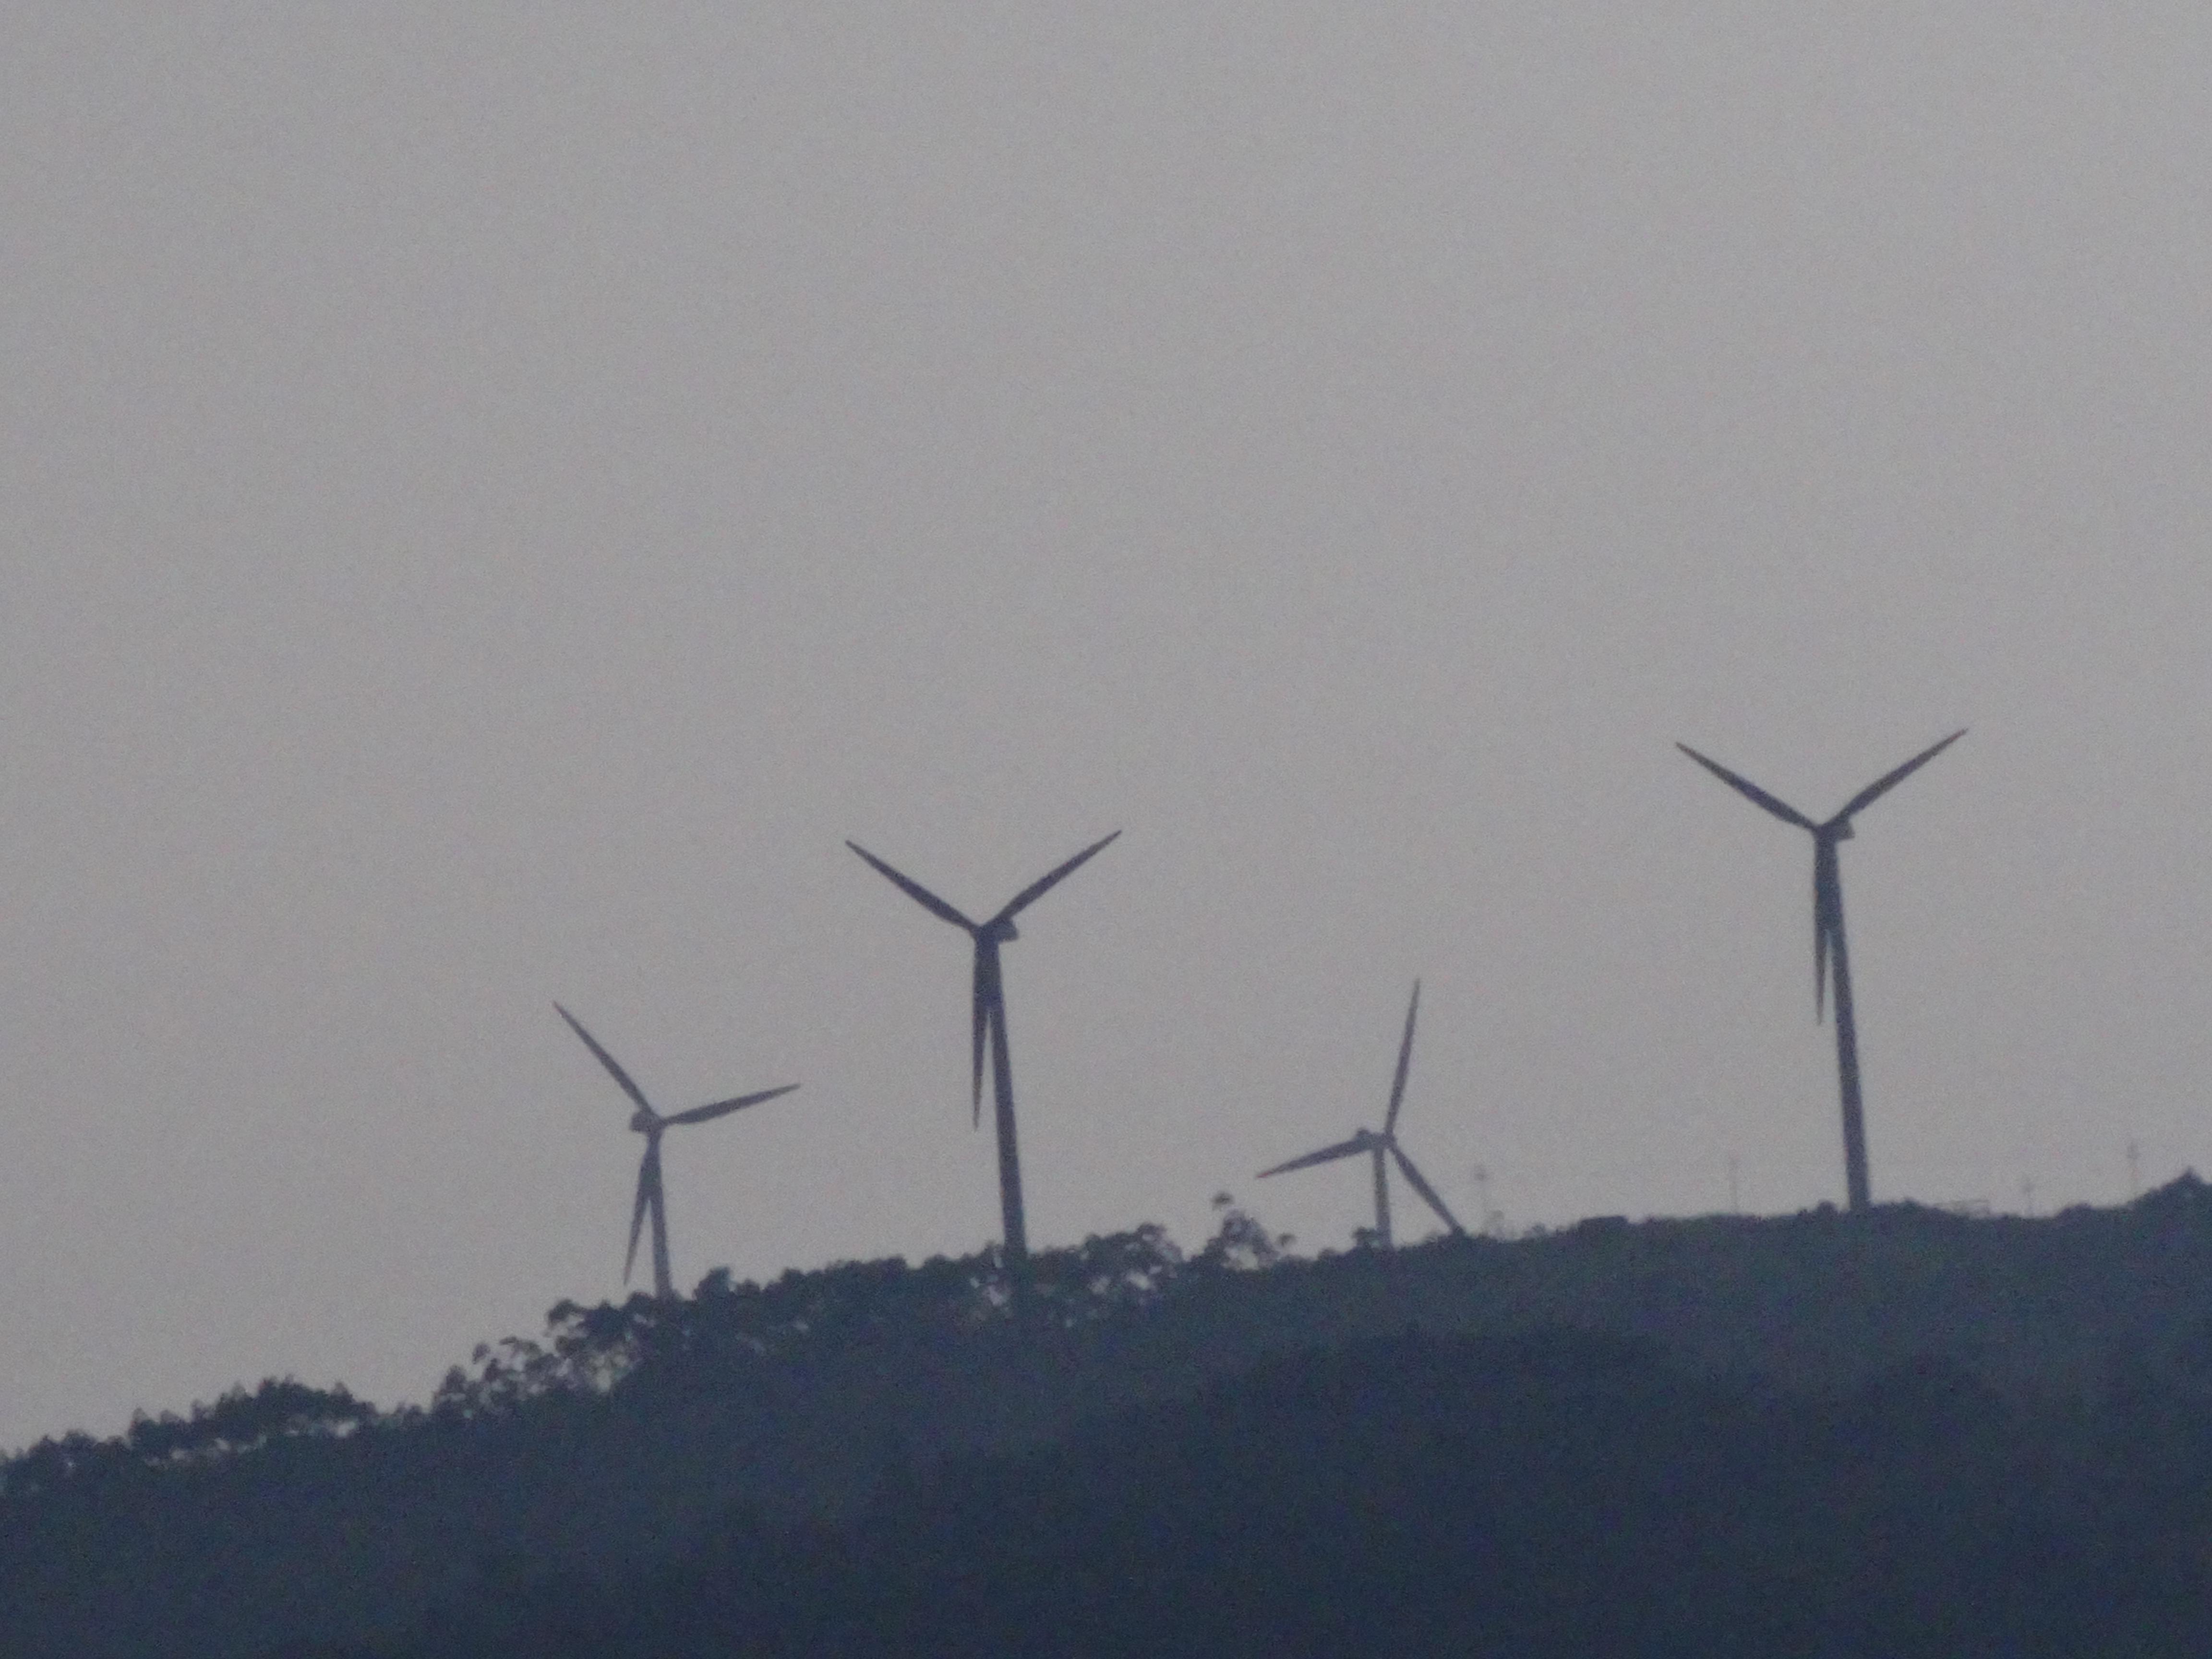 rustling wind